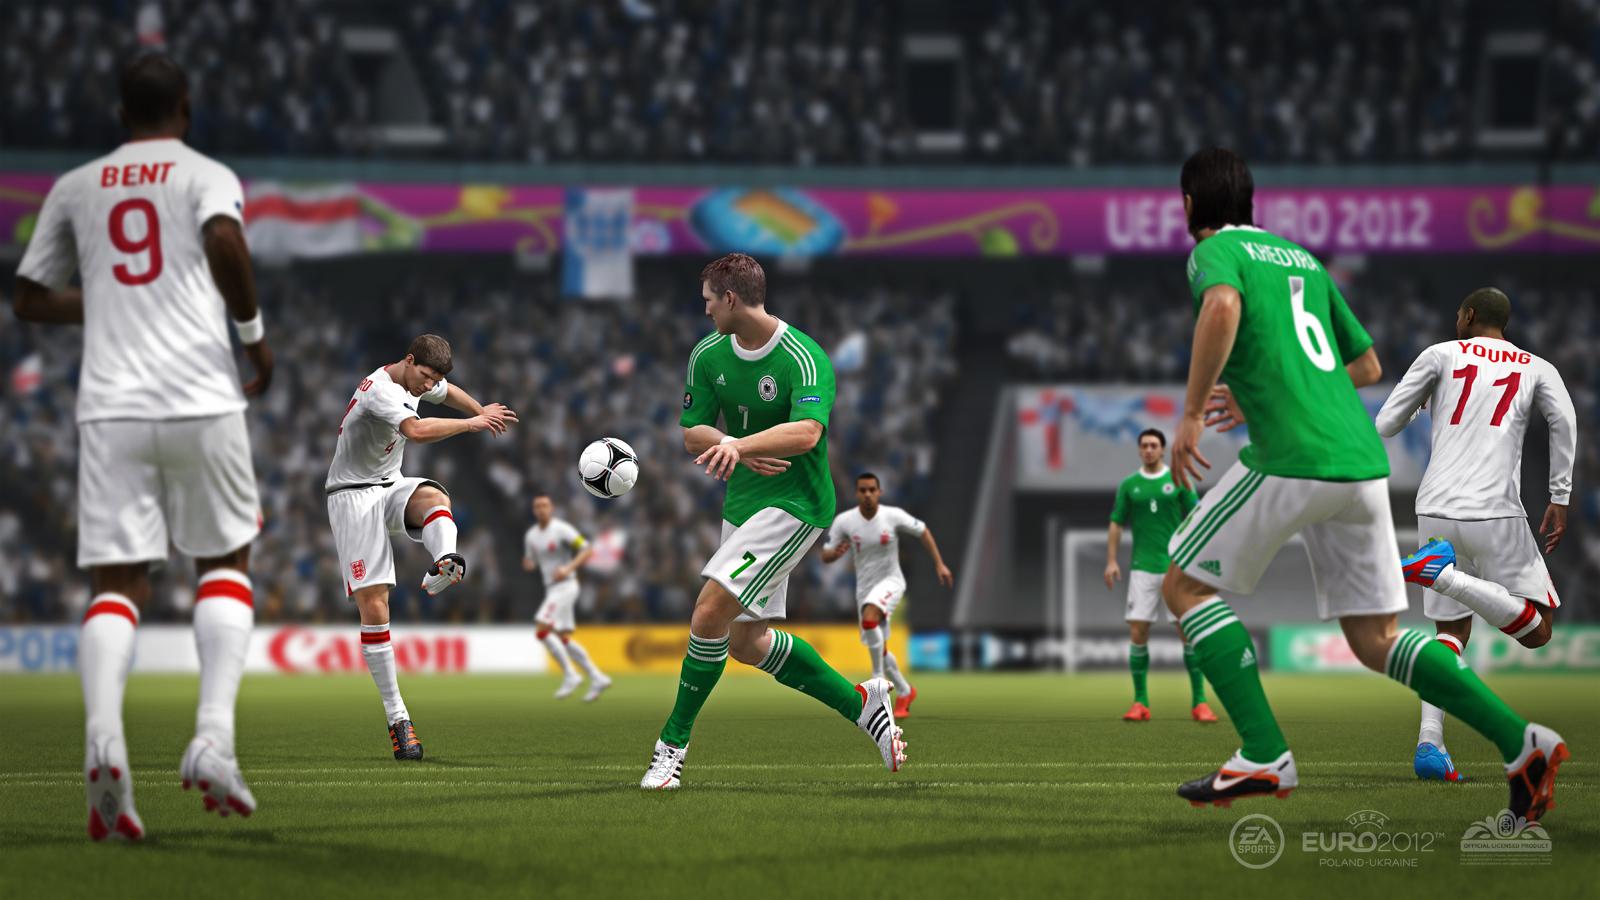 UEFA Euro 2012 Fully Full Version PC Game